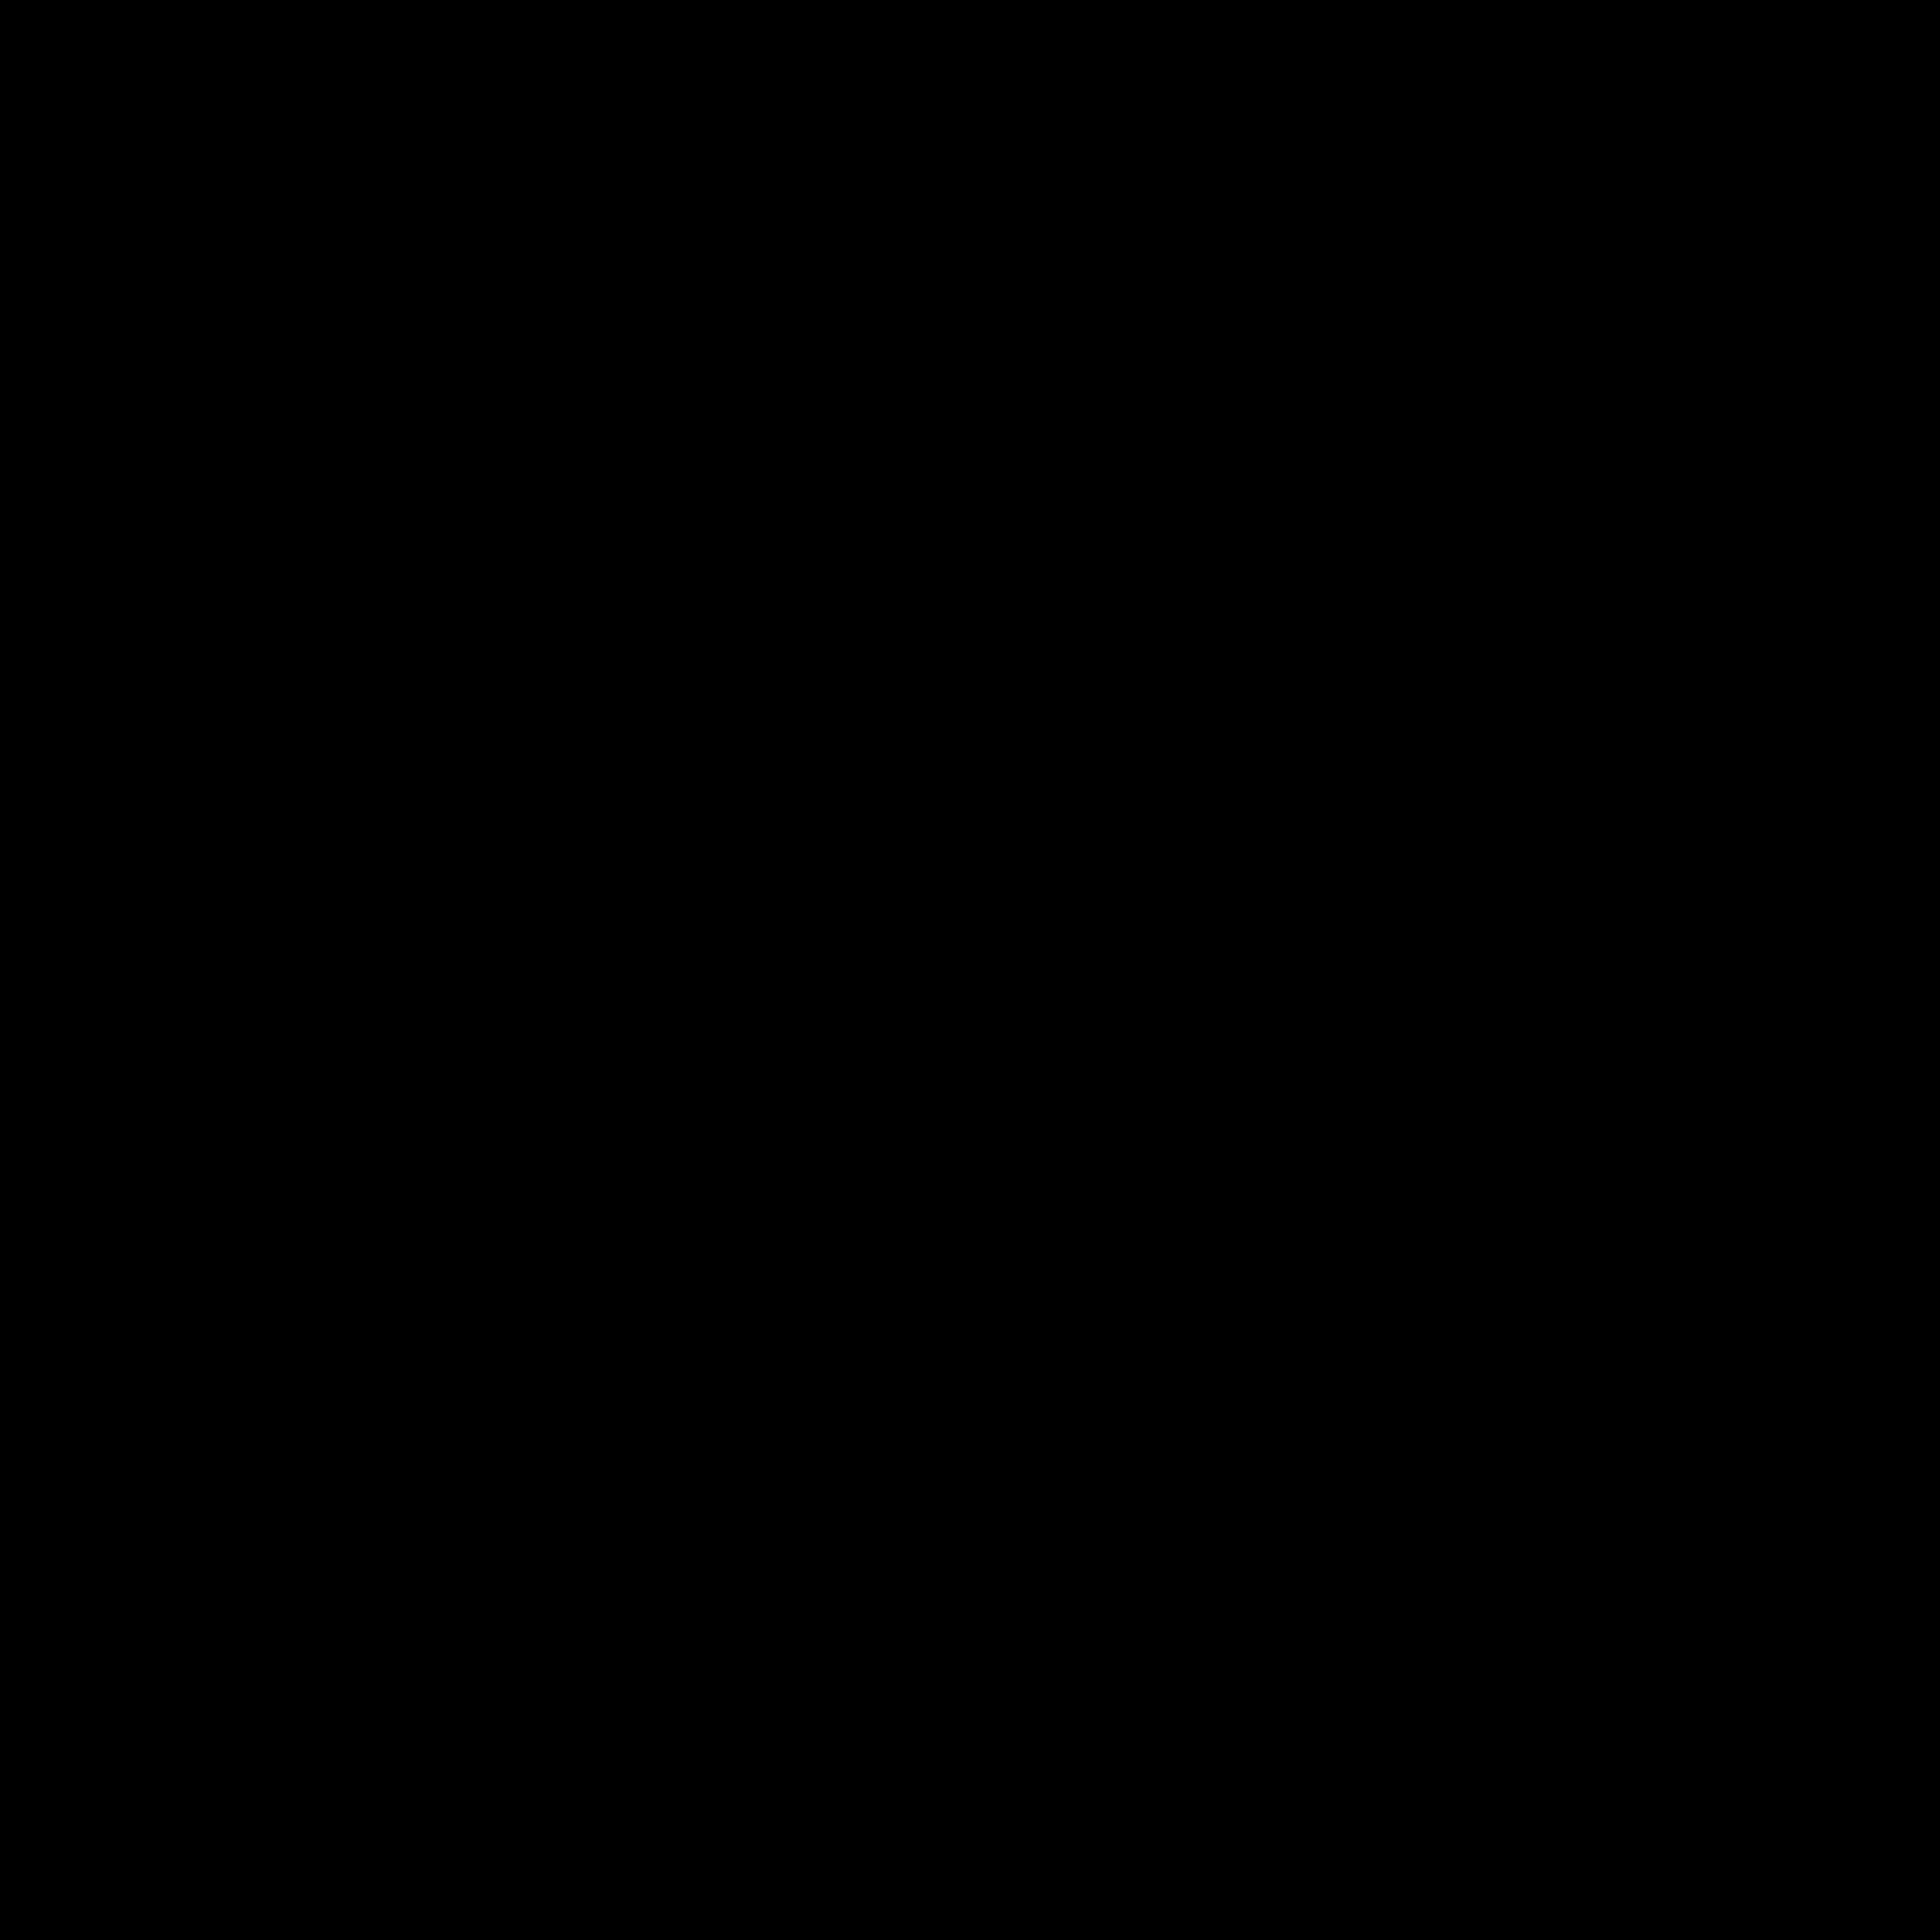 lancome-3-logo-png-transparent.png